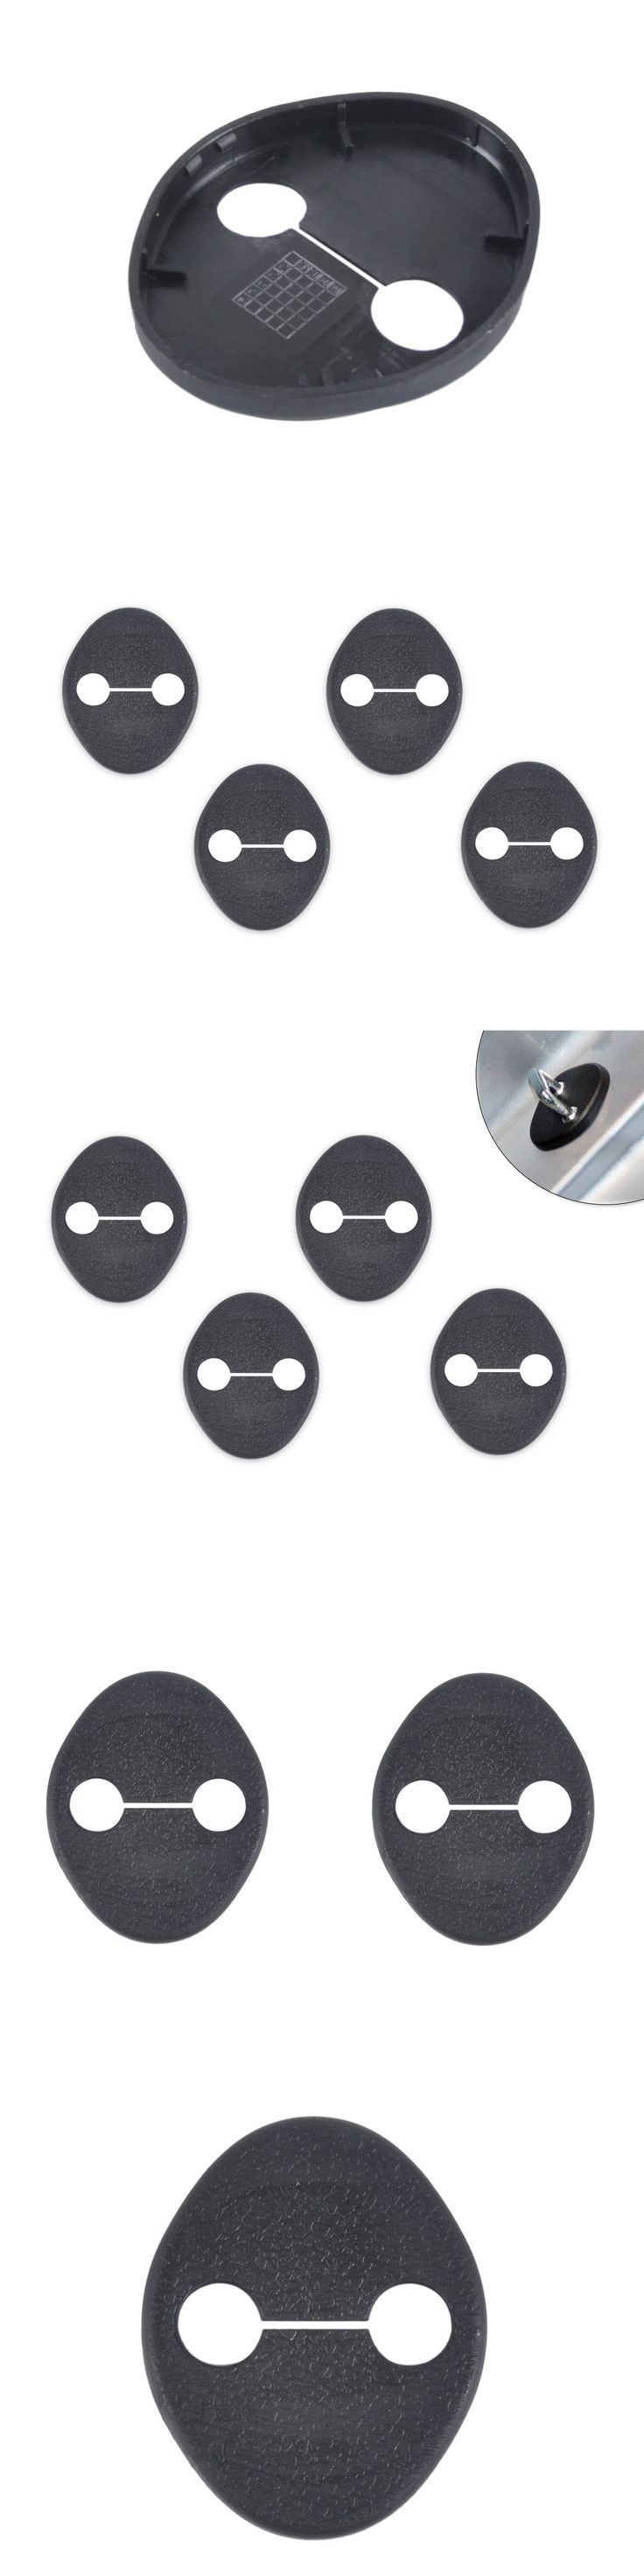 DWCX 4PCS Car Door Striker Cover Lock Protector Case for Hyundai Elantra Sonata 8 IX35 I30 Kia Sportage 2010 2011 2012 2013 +